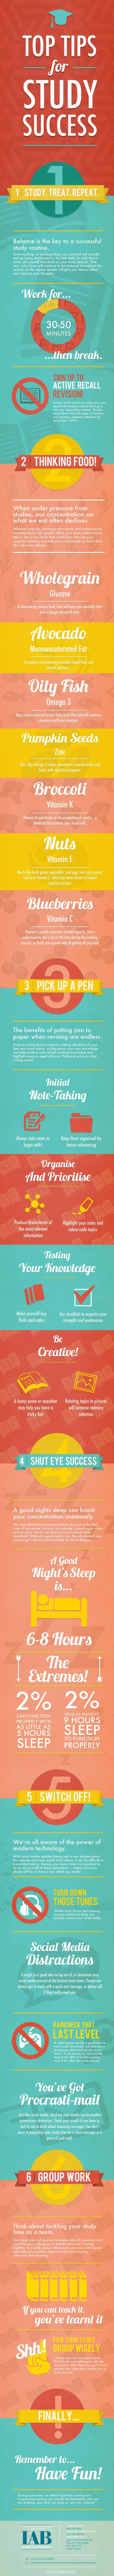 IAB_Study_Tips